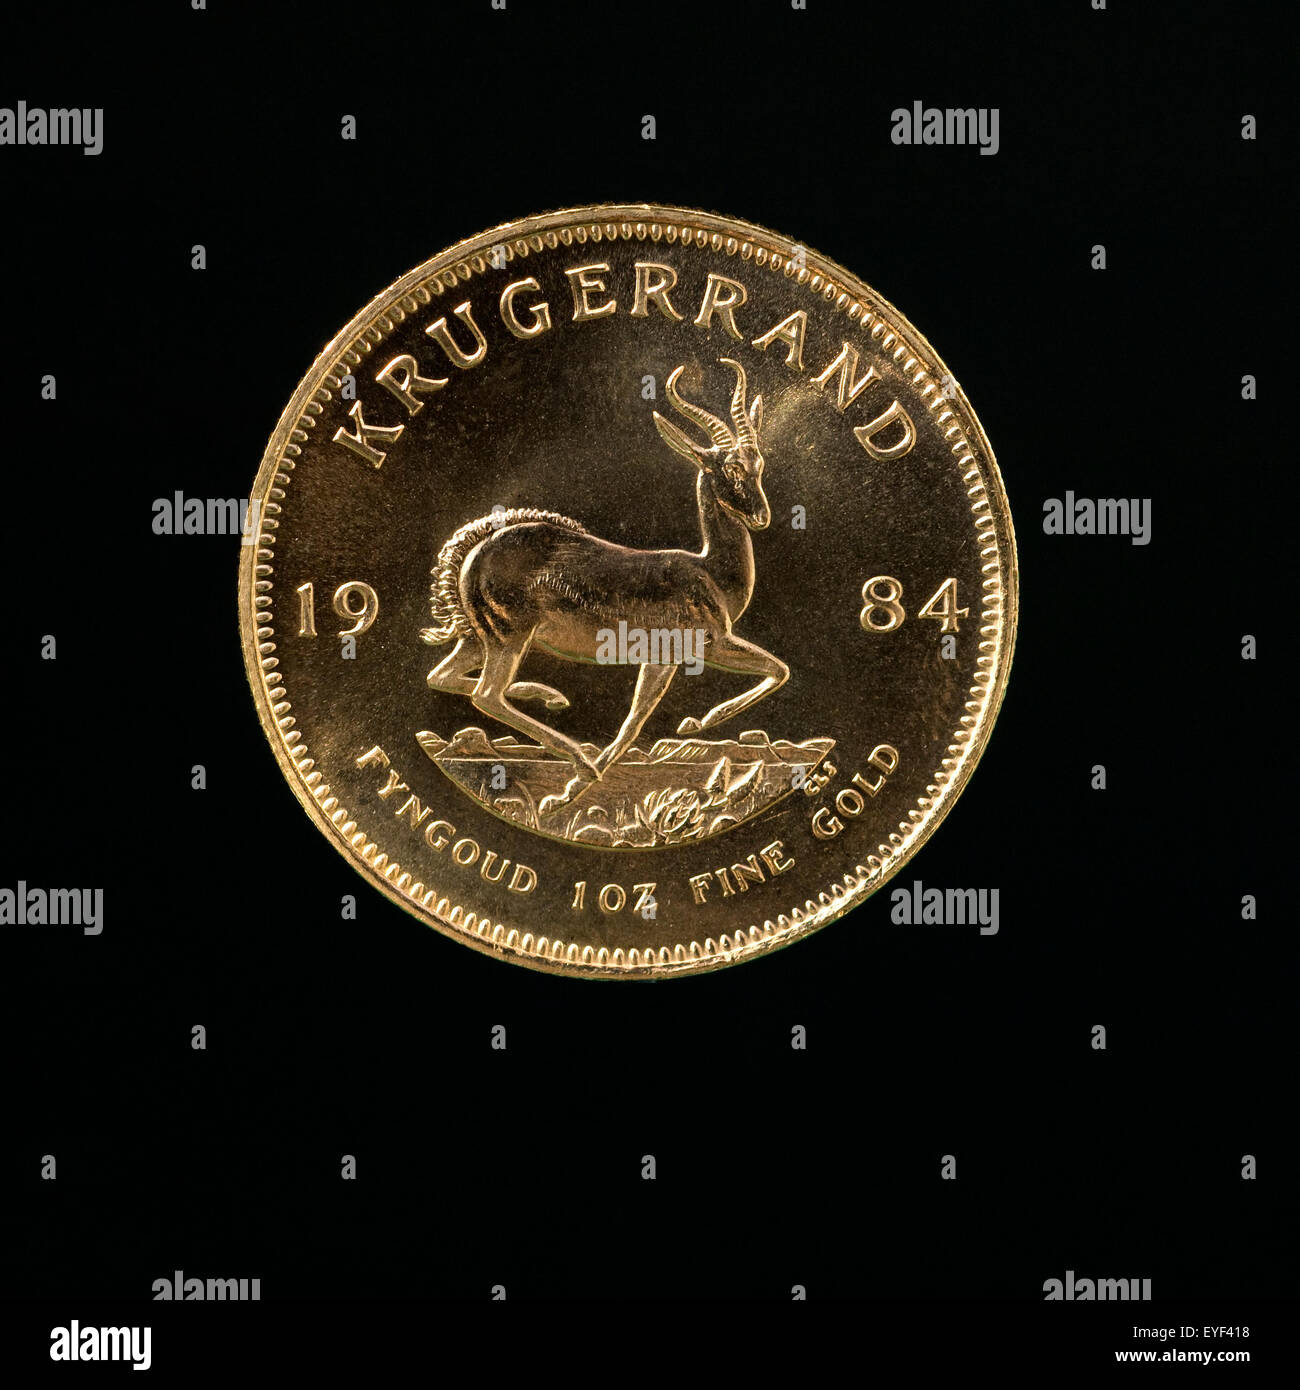 Kruegerrand-Goldmuenze, - Stock Image